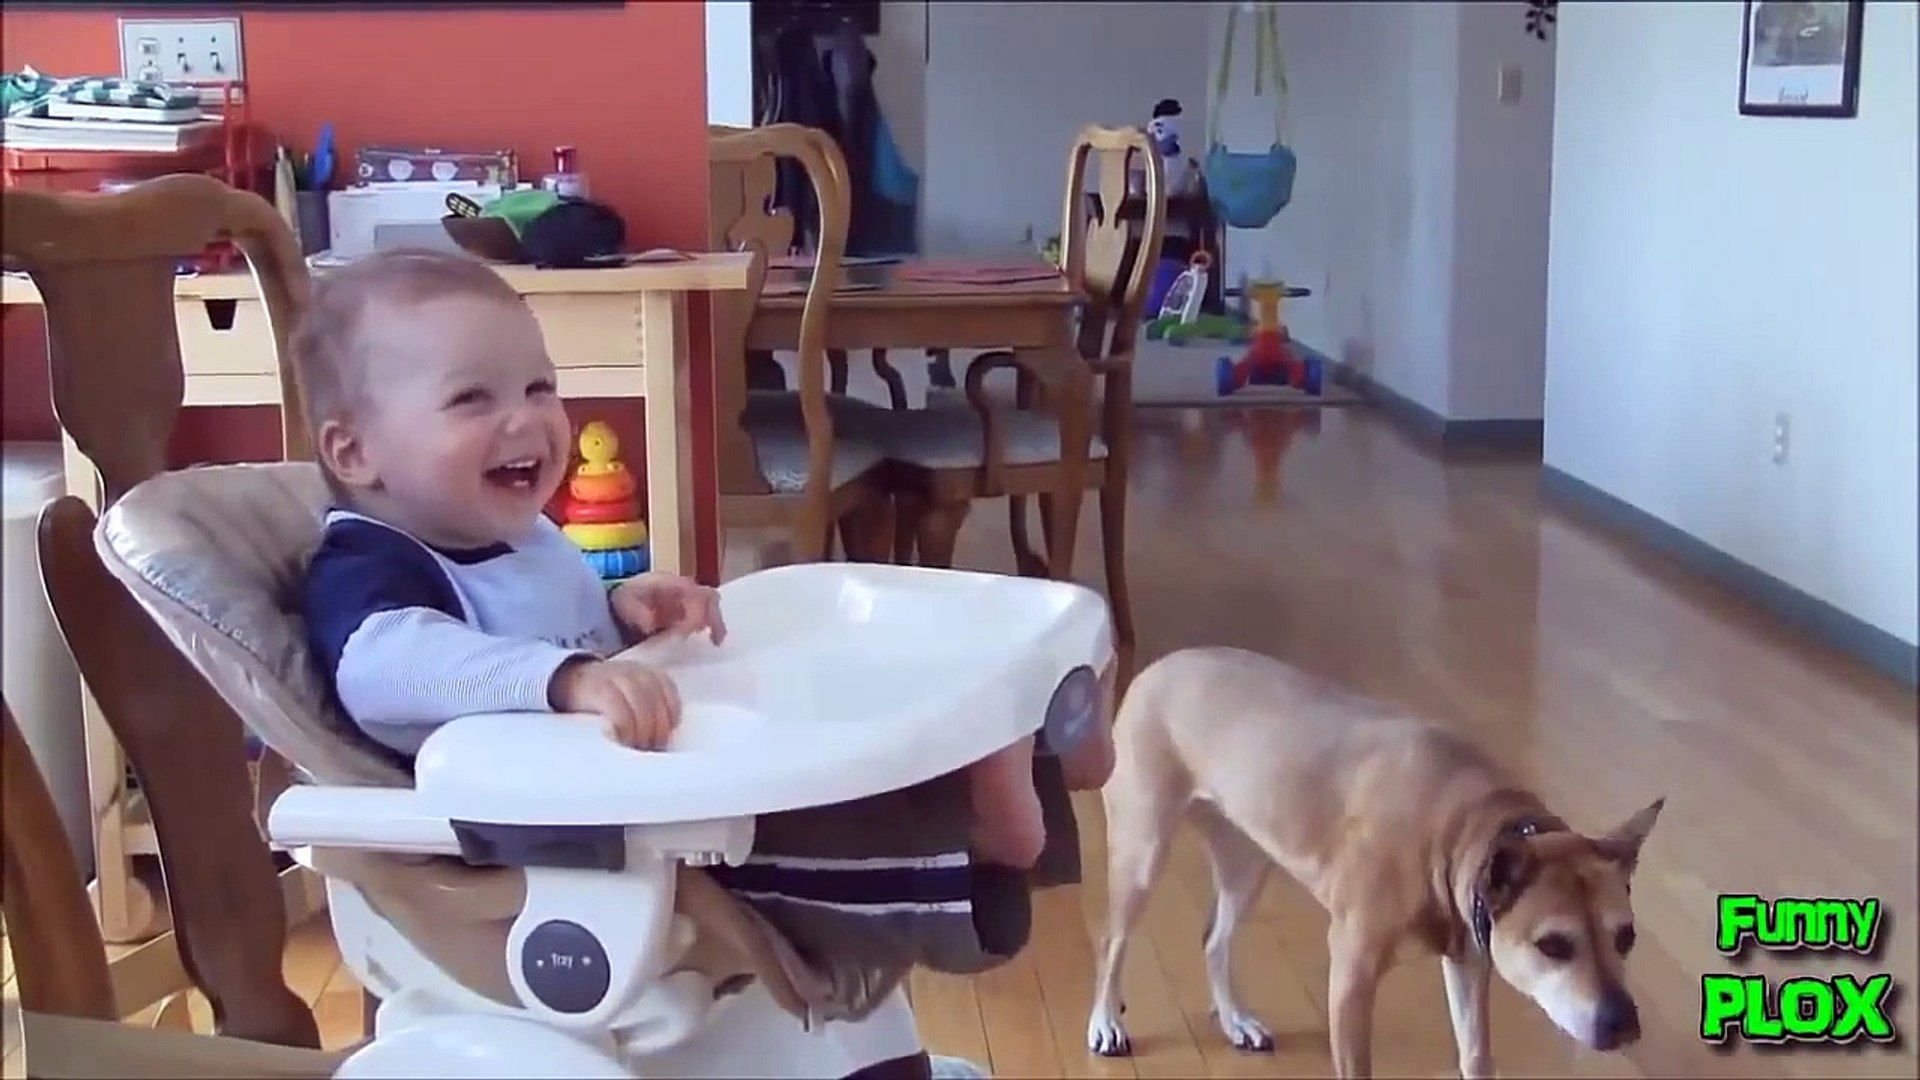 Bebelusi haiosi, Videoclipuri amuzante cu bebelusi, Cute babies doing funny things, Bebes chistosos